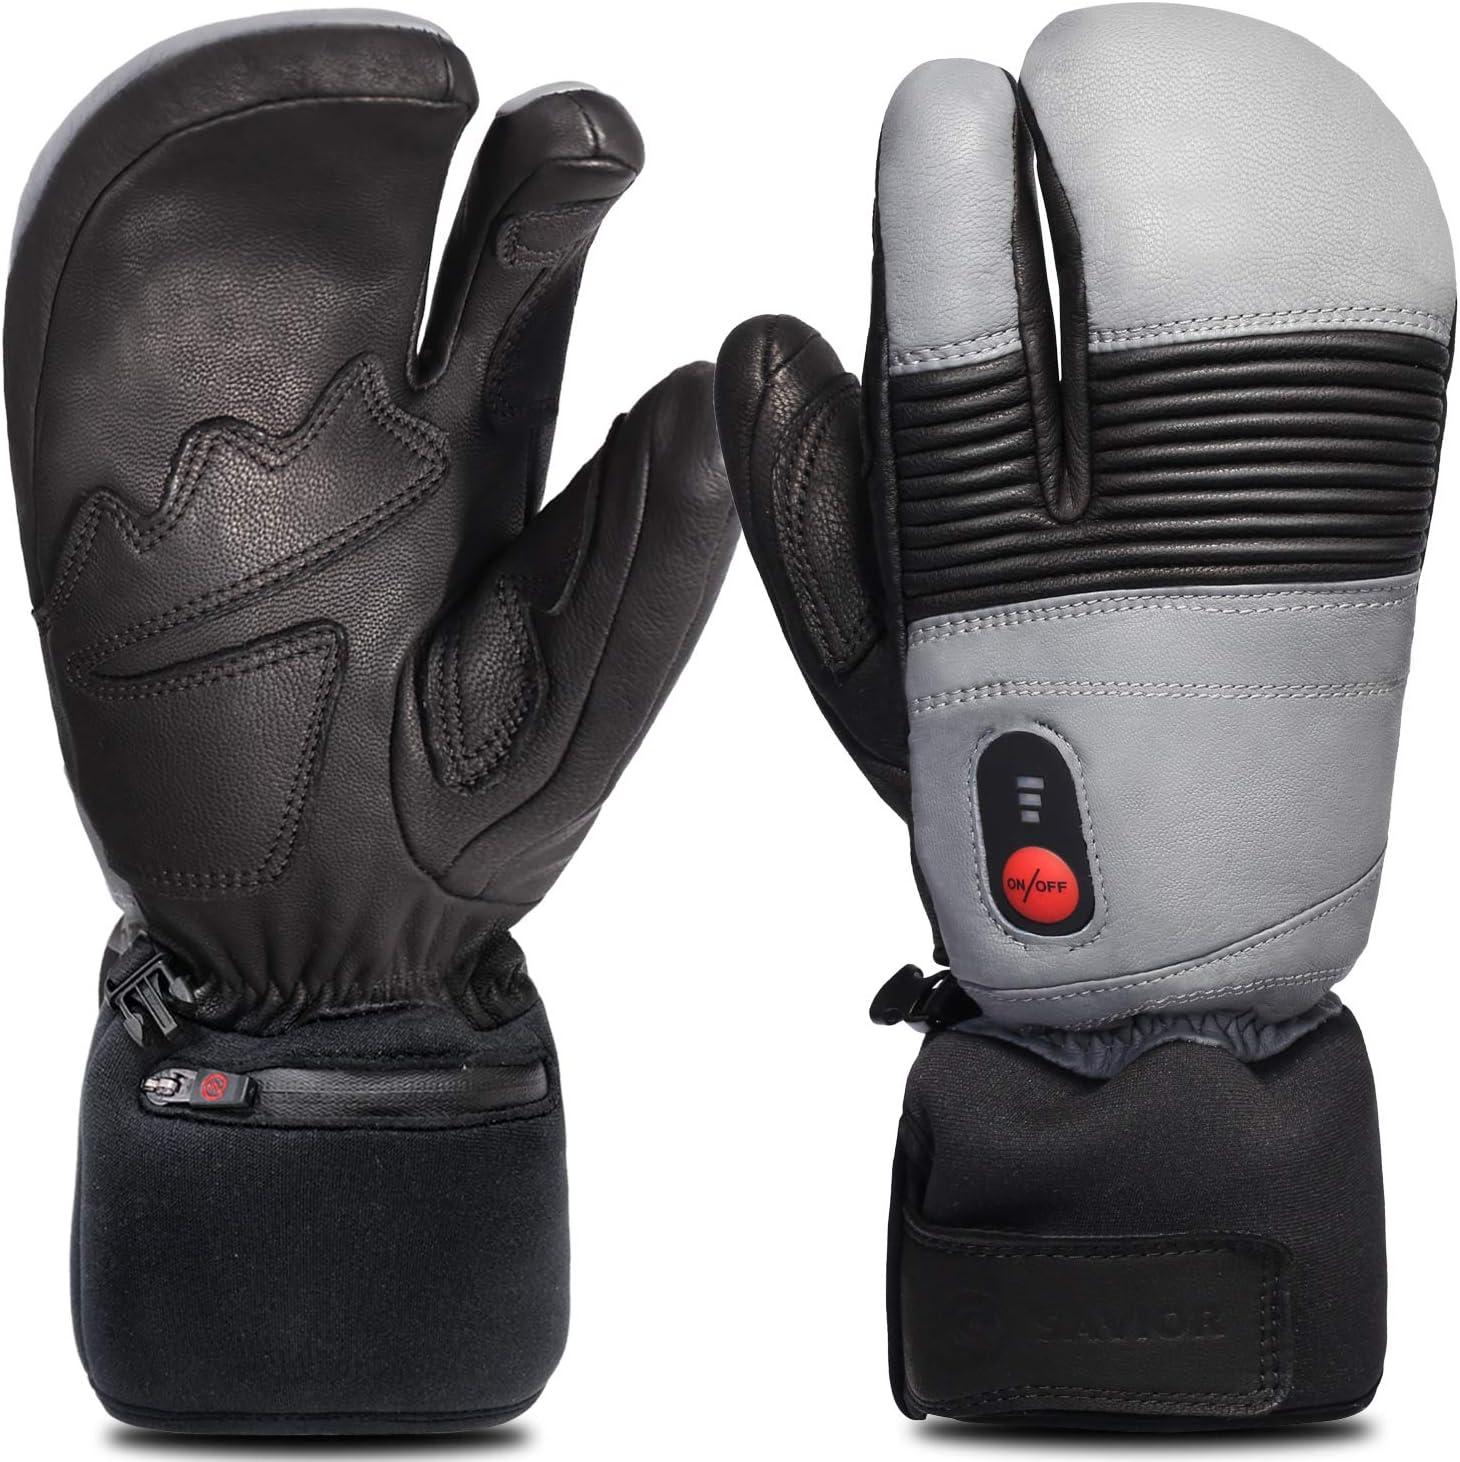 Skiing Heated Gloves,Arthritis Glove Savior Heated Gloves for Men Women